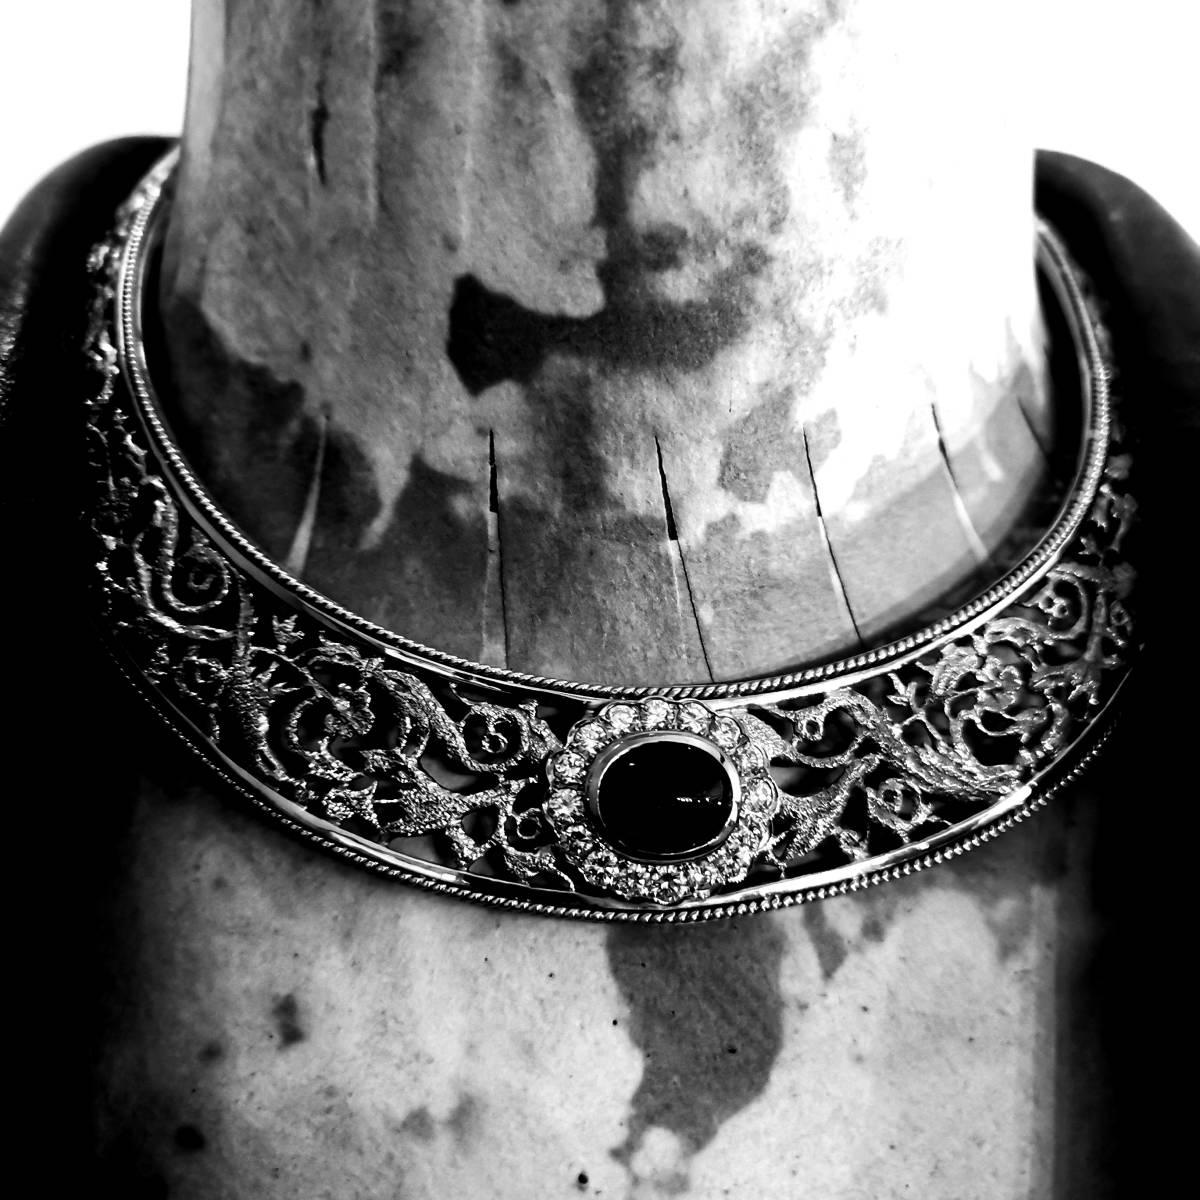 F2326 逸品【J.YANES】ヤーネス 美しいエメ 絶品ダイヤ 最高級18金無垢セレブリティネックレス 長さ36cm 重量105.26g 幅11.3~21.6mm_画像1